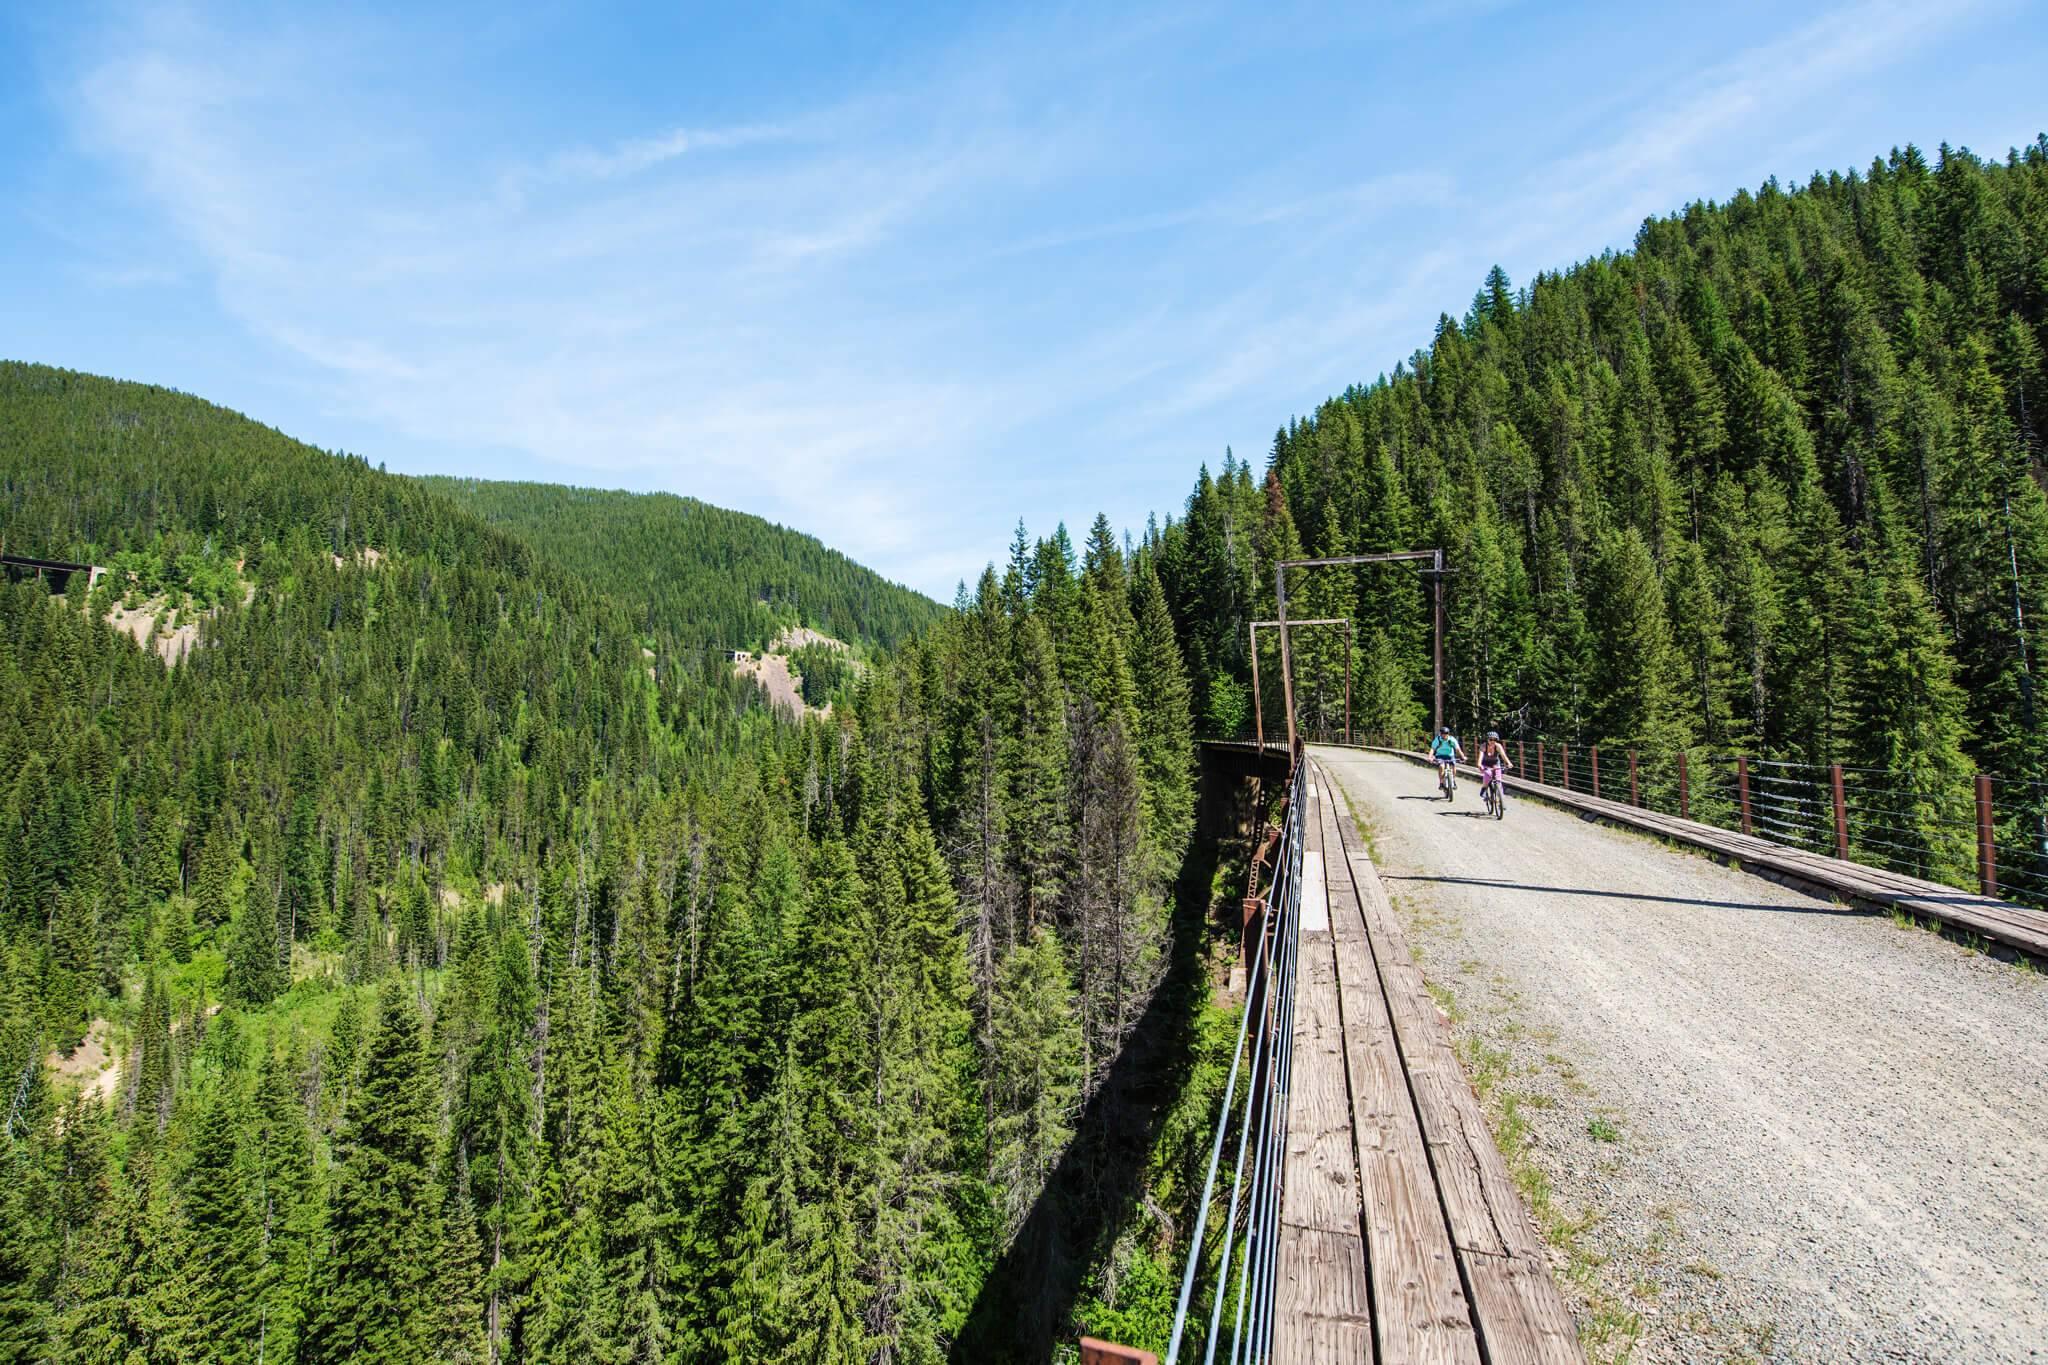 Riding over a trestle bridge on the Route of the Hiawatha. Photo Credit: Idaho Tourism